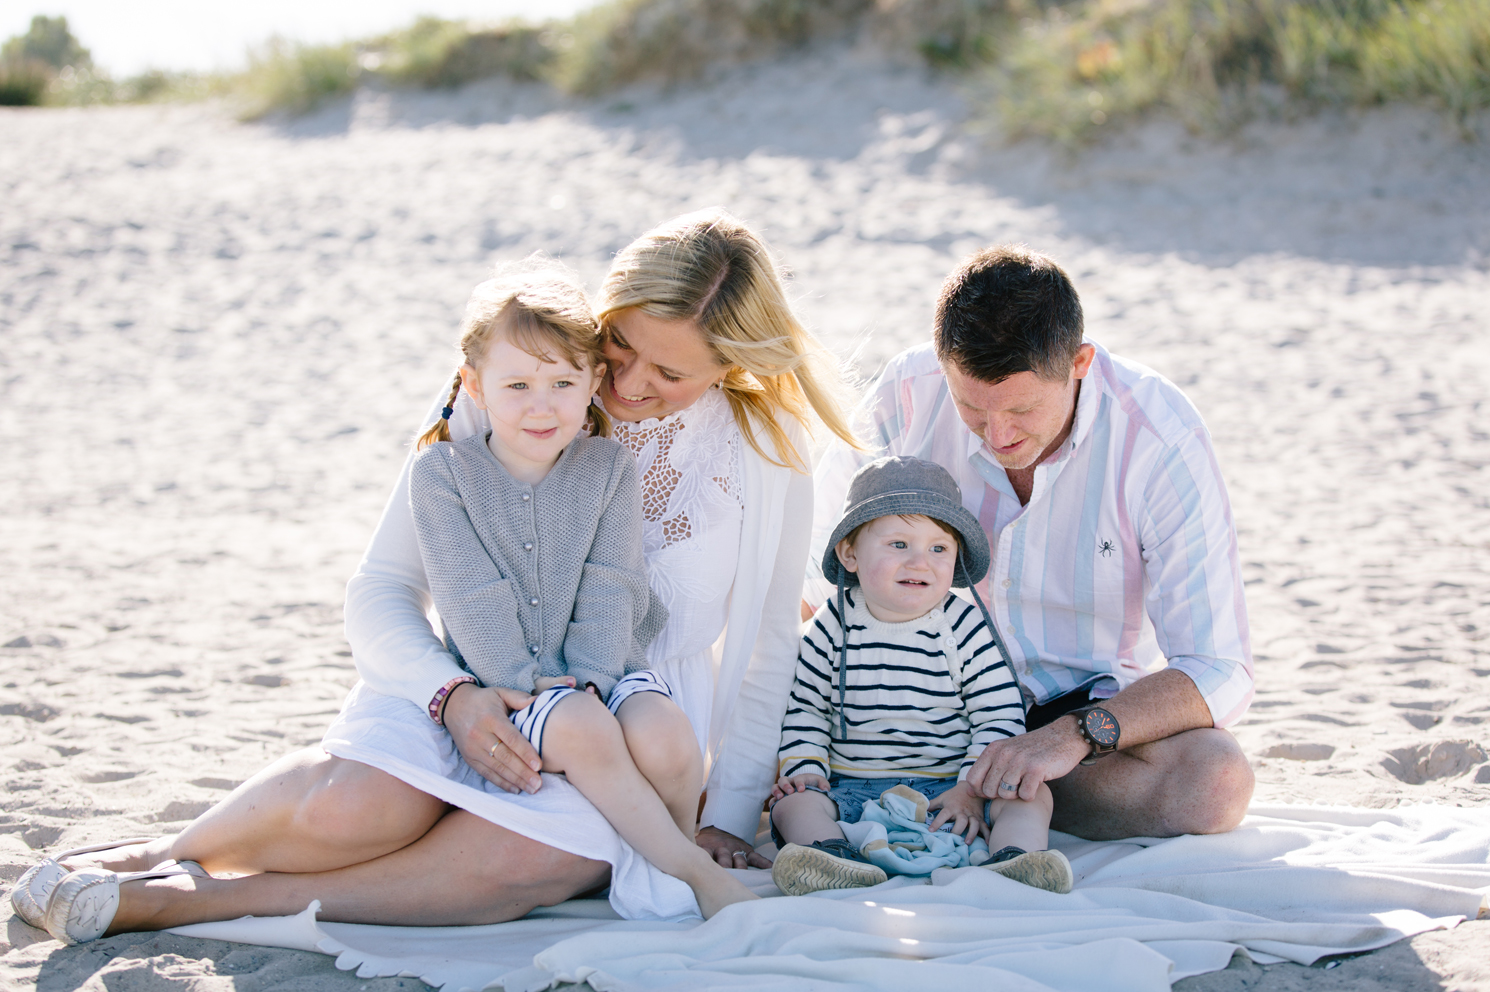 familjefotografering-malmo-kallbadhuset-maria-o-photo-lek-gladje-karlek-14